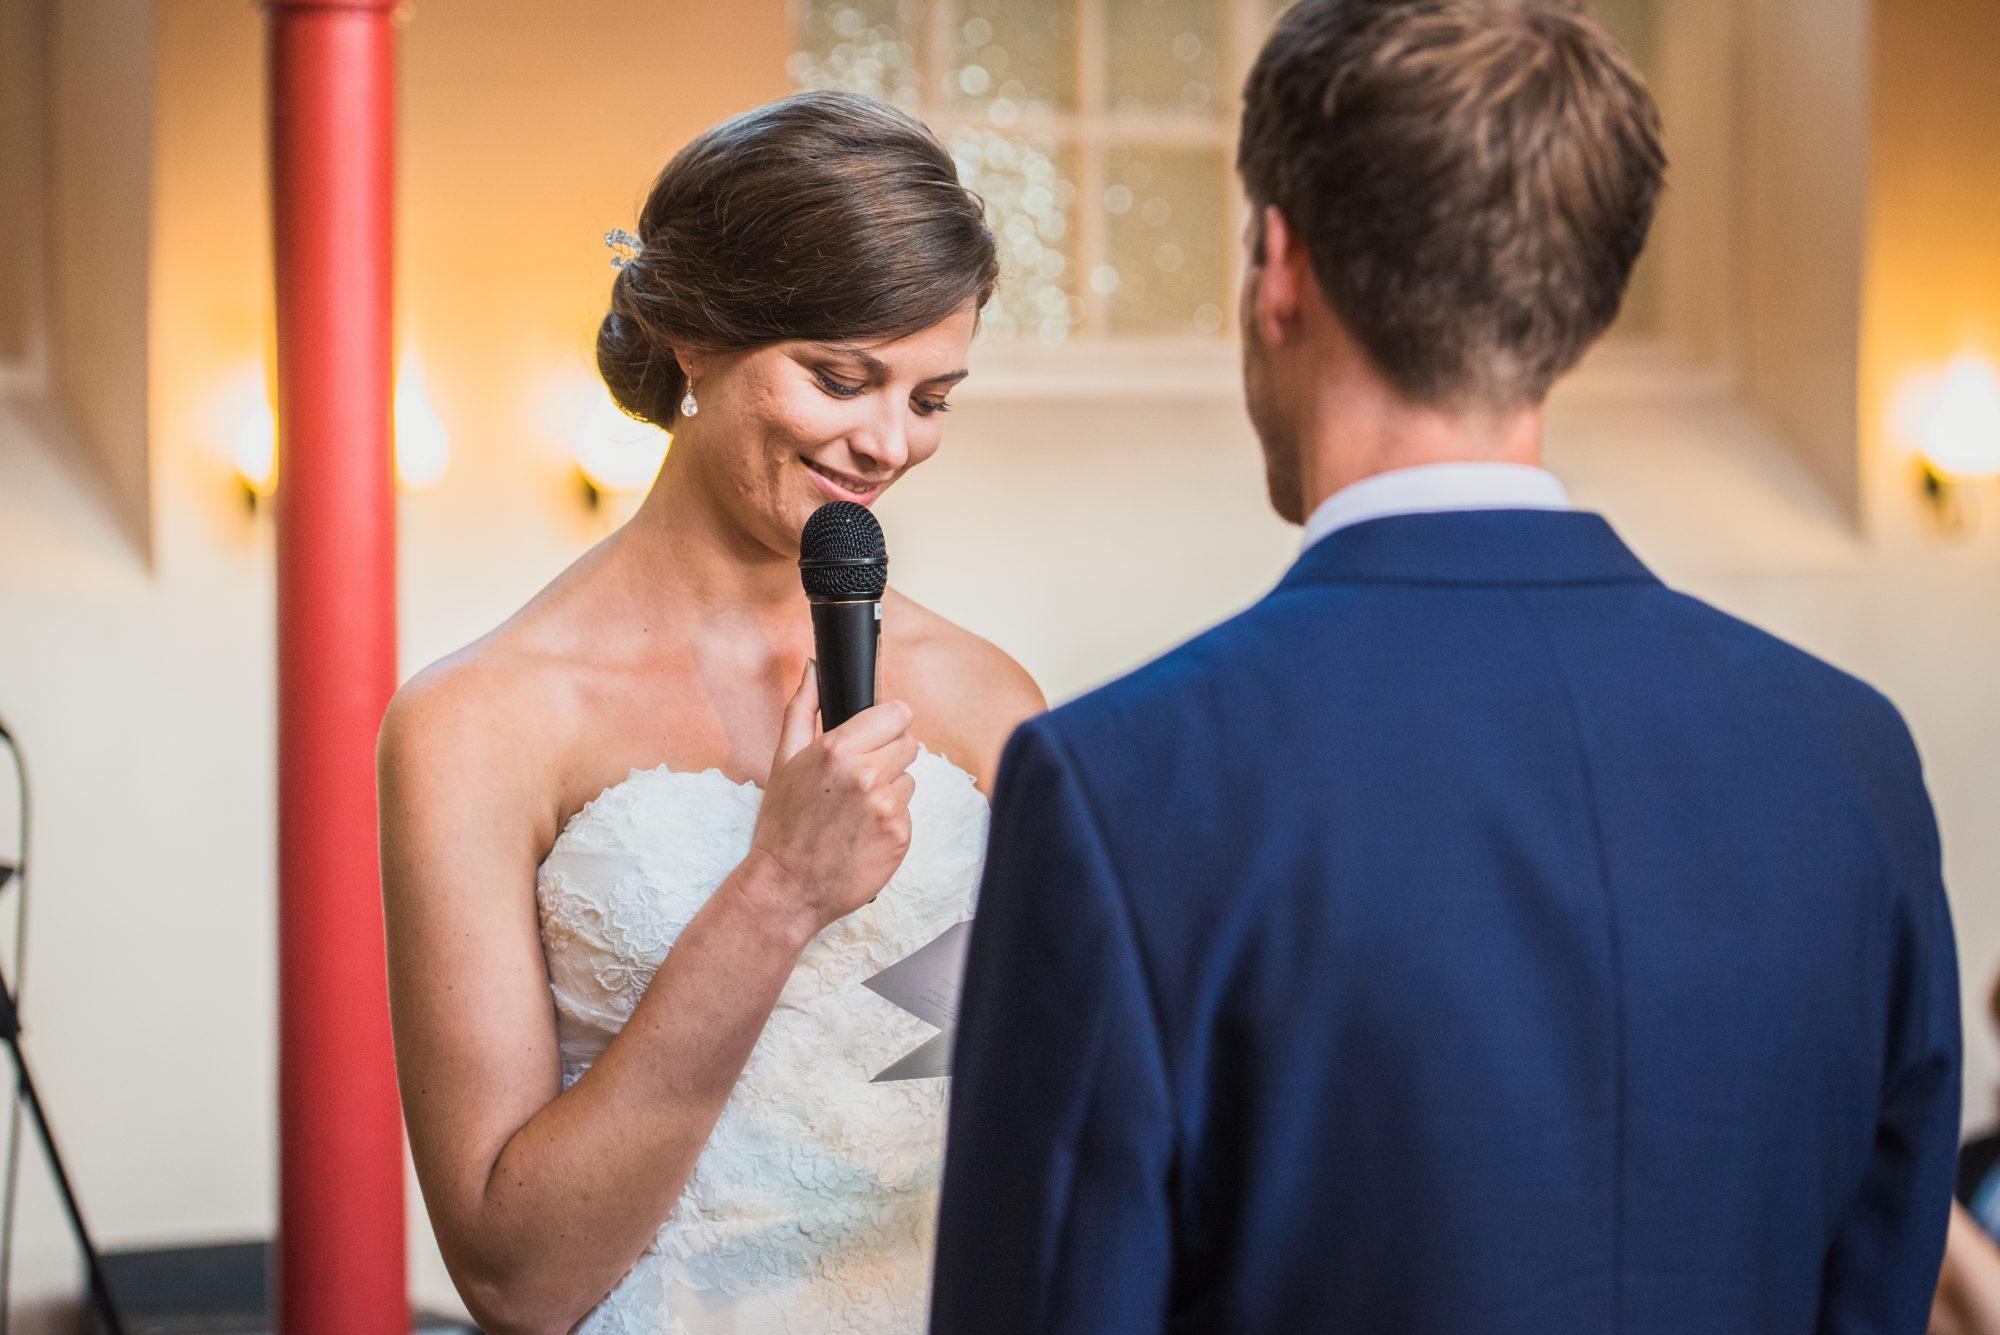 bruiloft-roland-annewil-473